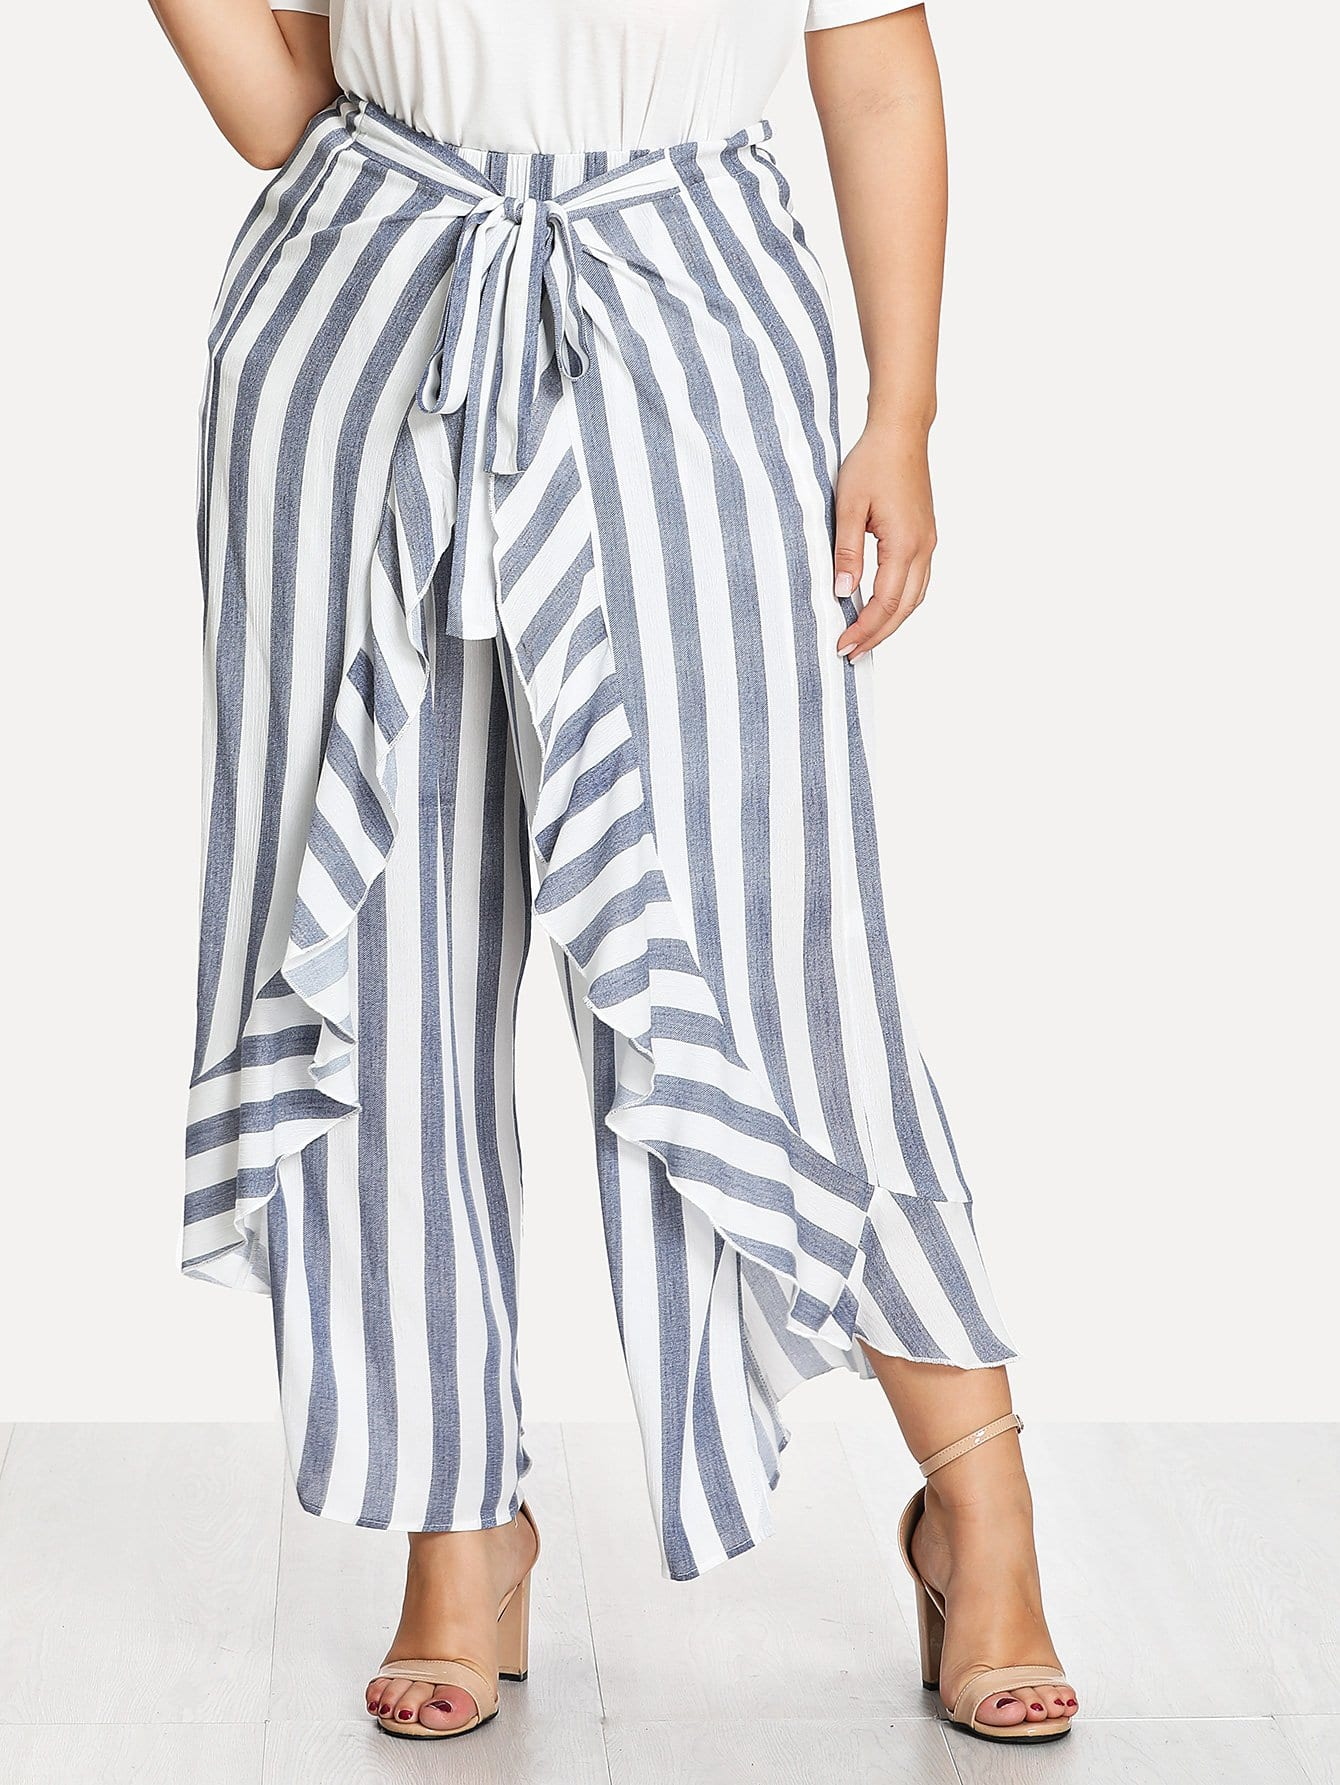 Self Tie Ruffle Trim Striped Palazzo Pants striped ruffled waist self tie pants